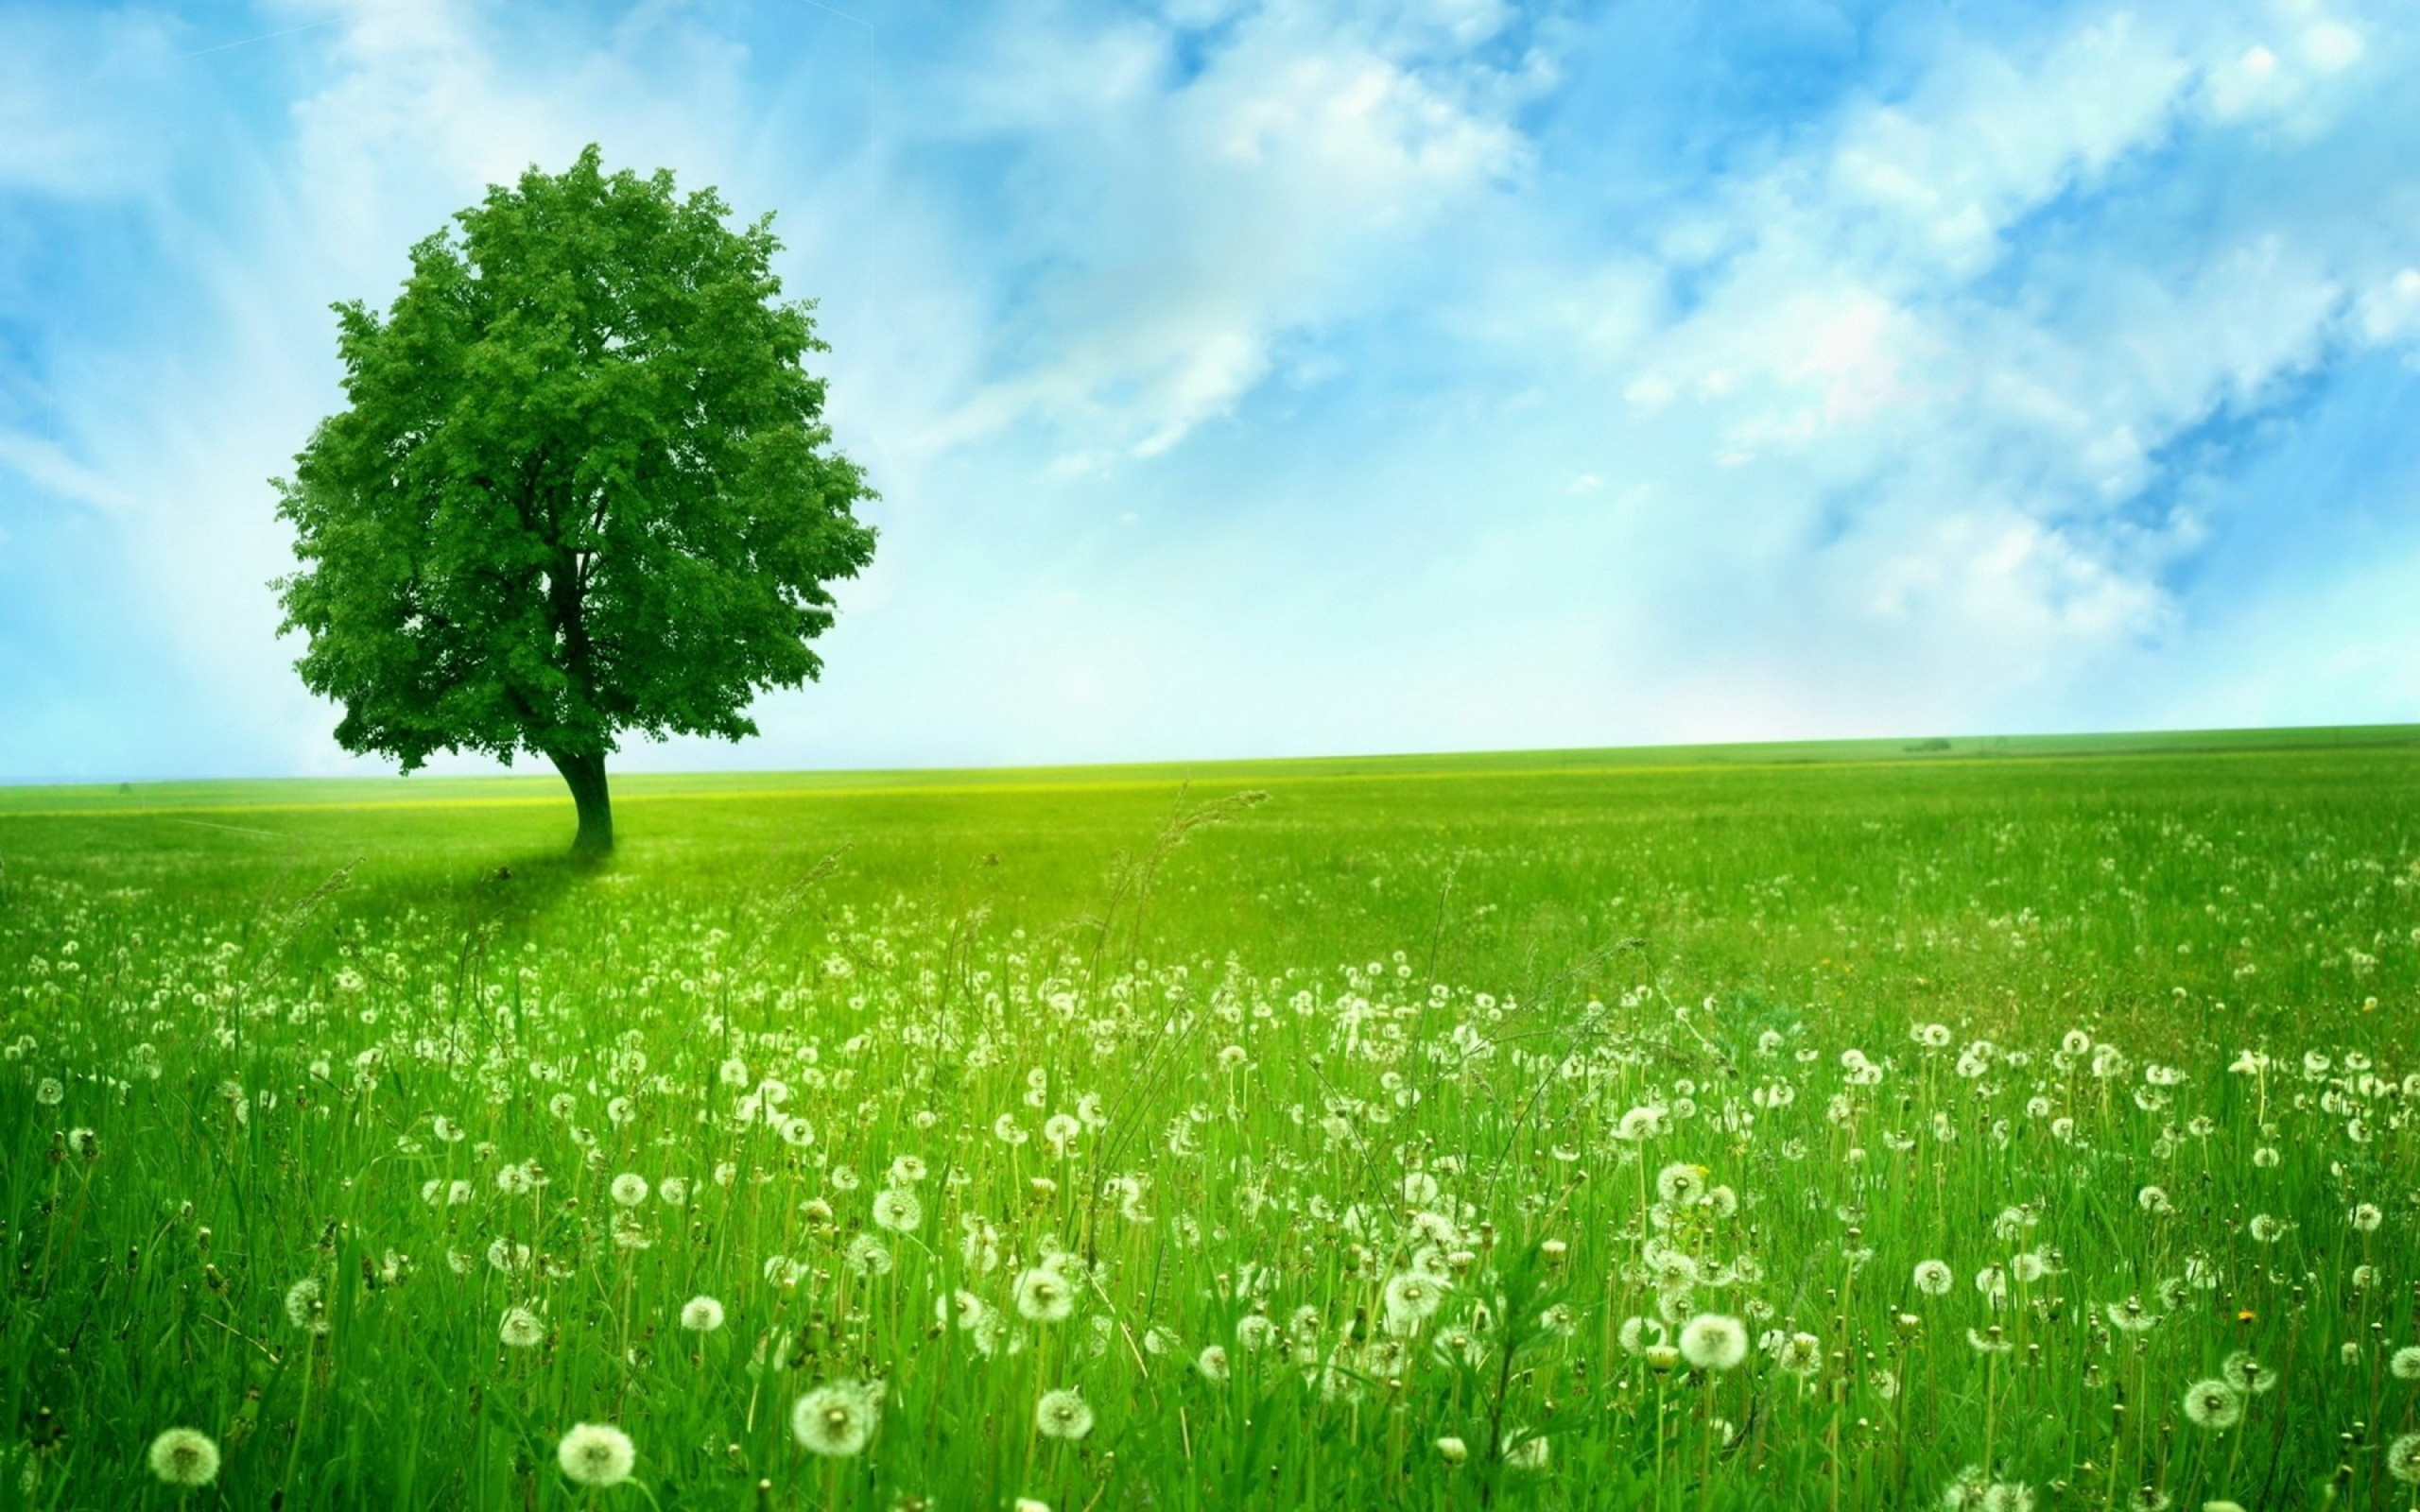 Natural Wood Meadow Grass Sky Hd Wallpaper : Wallpapers13 com